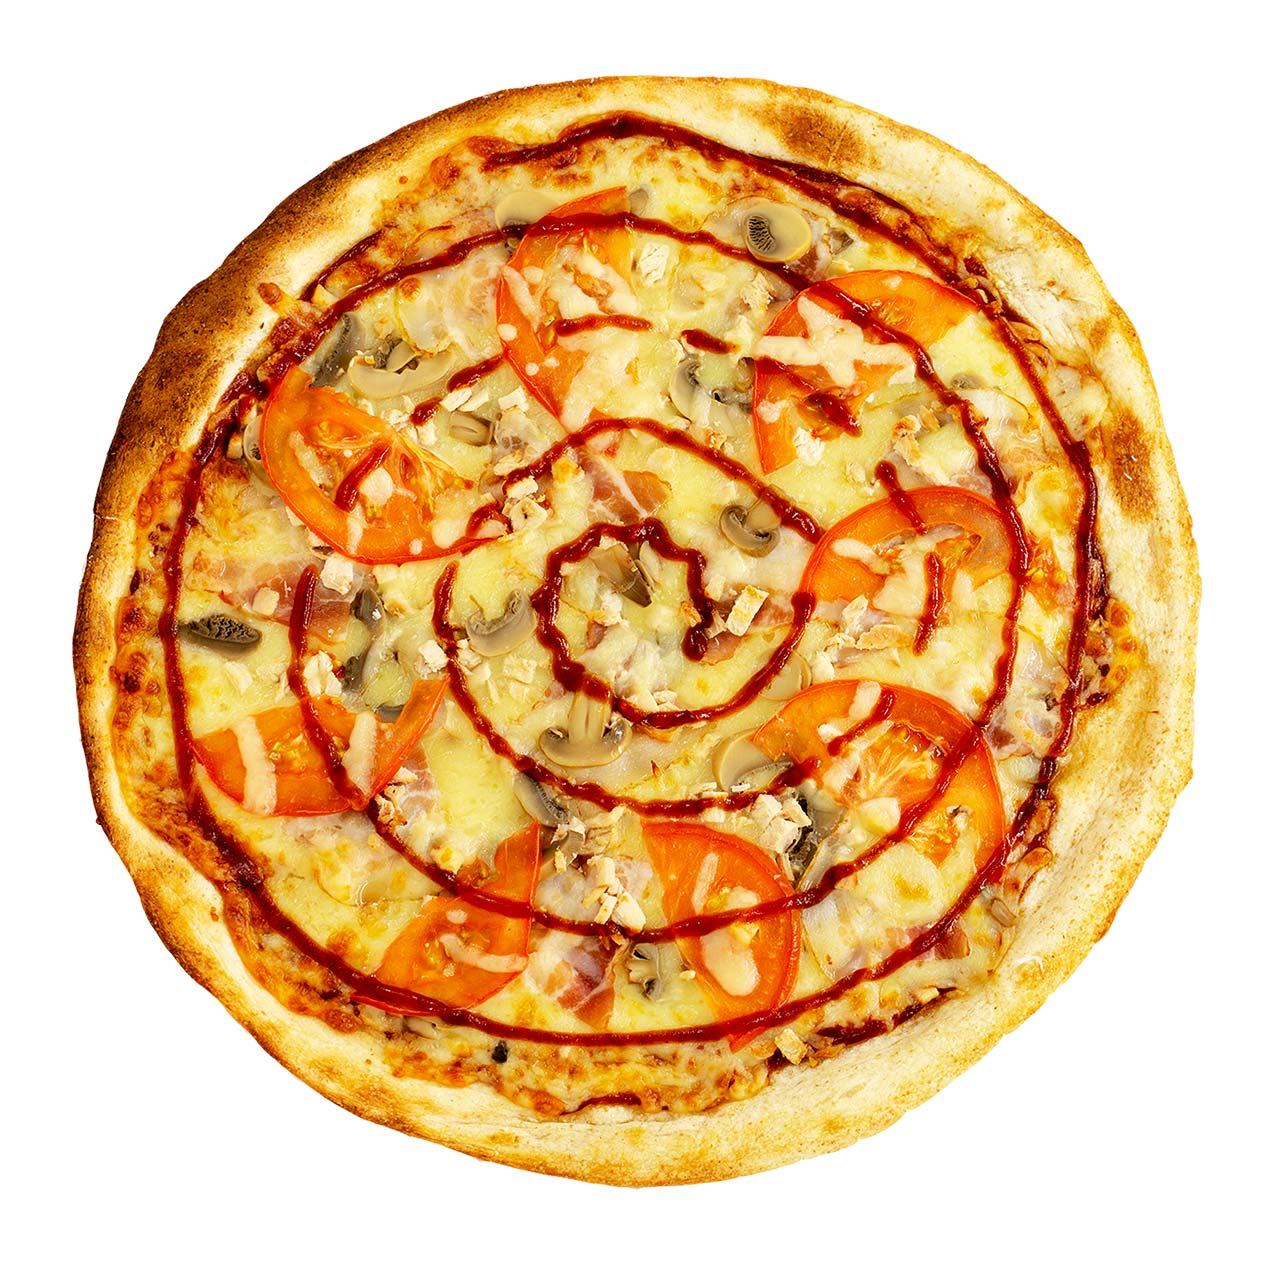 BBQ Калифорнийская Pizza Queen